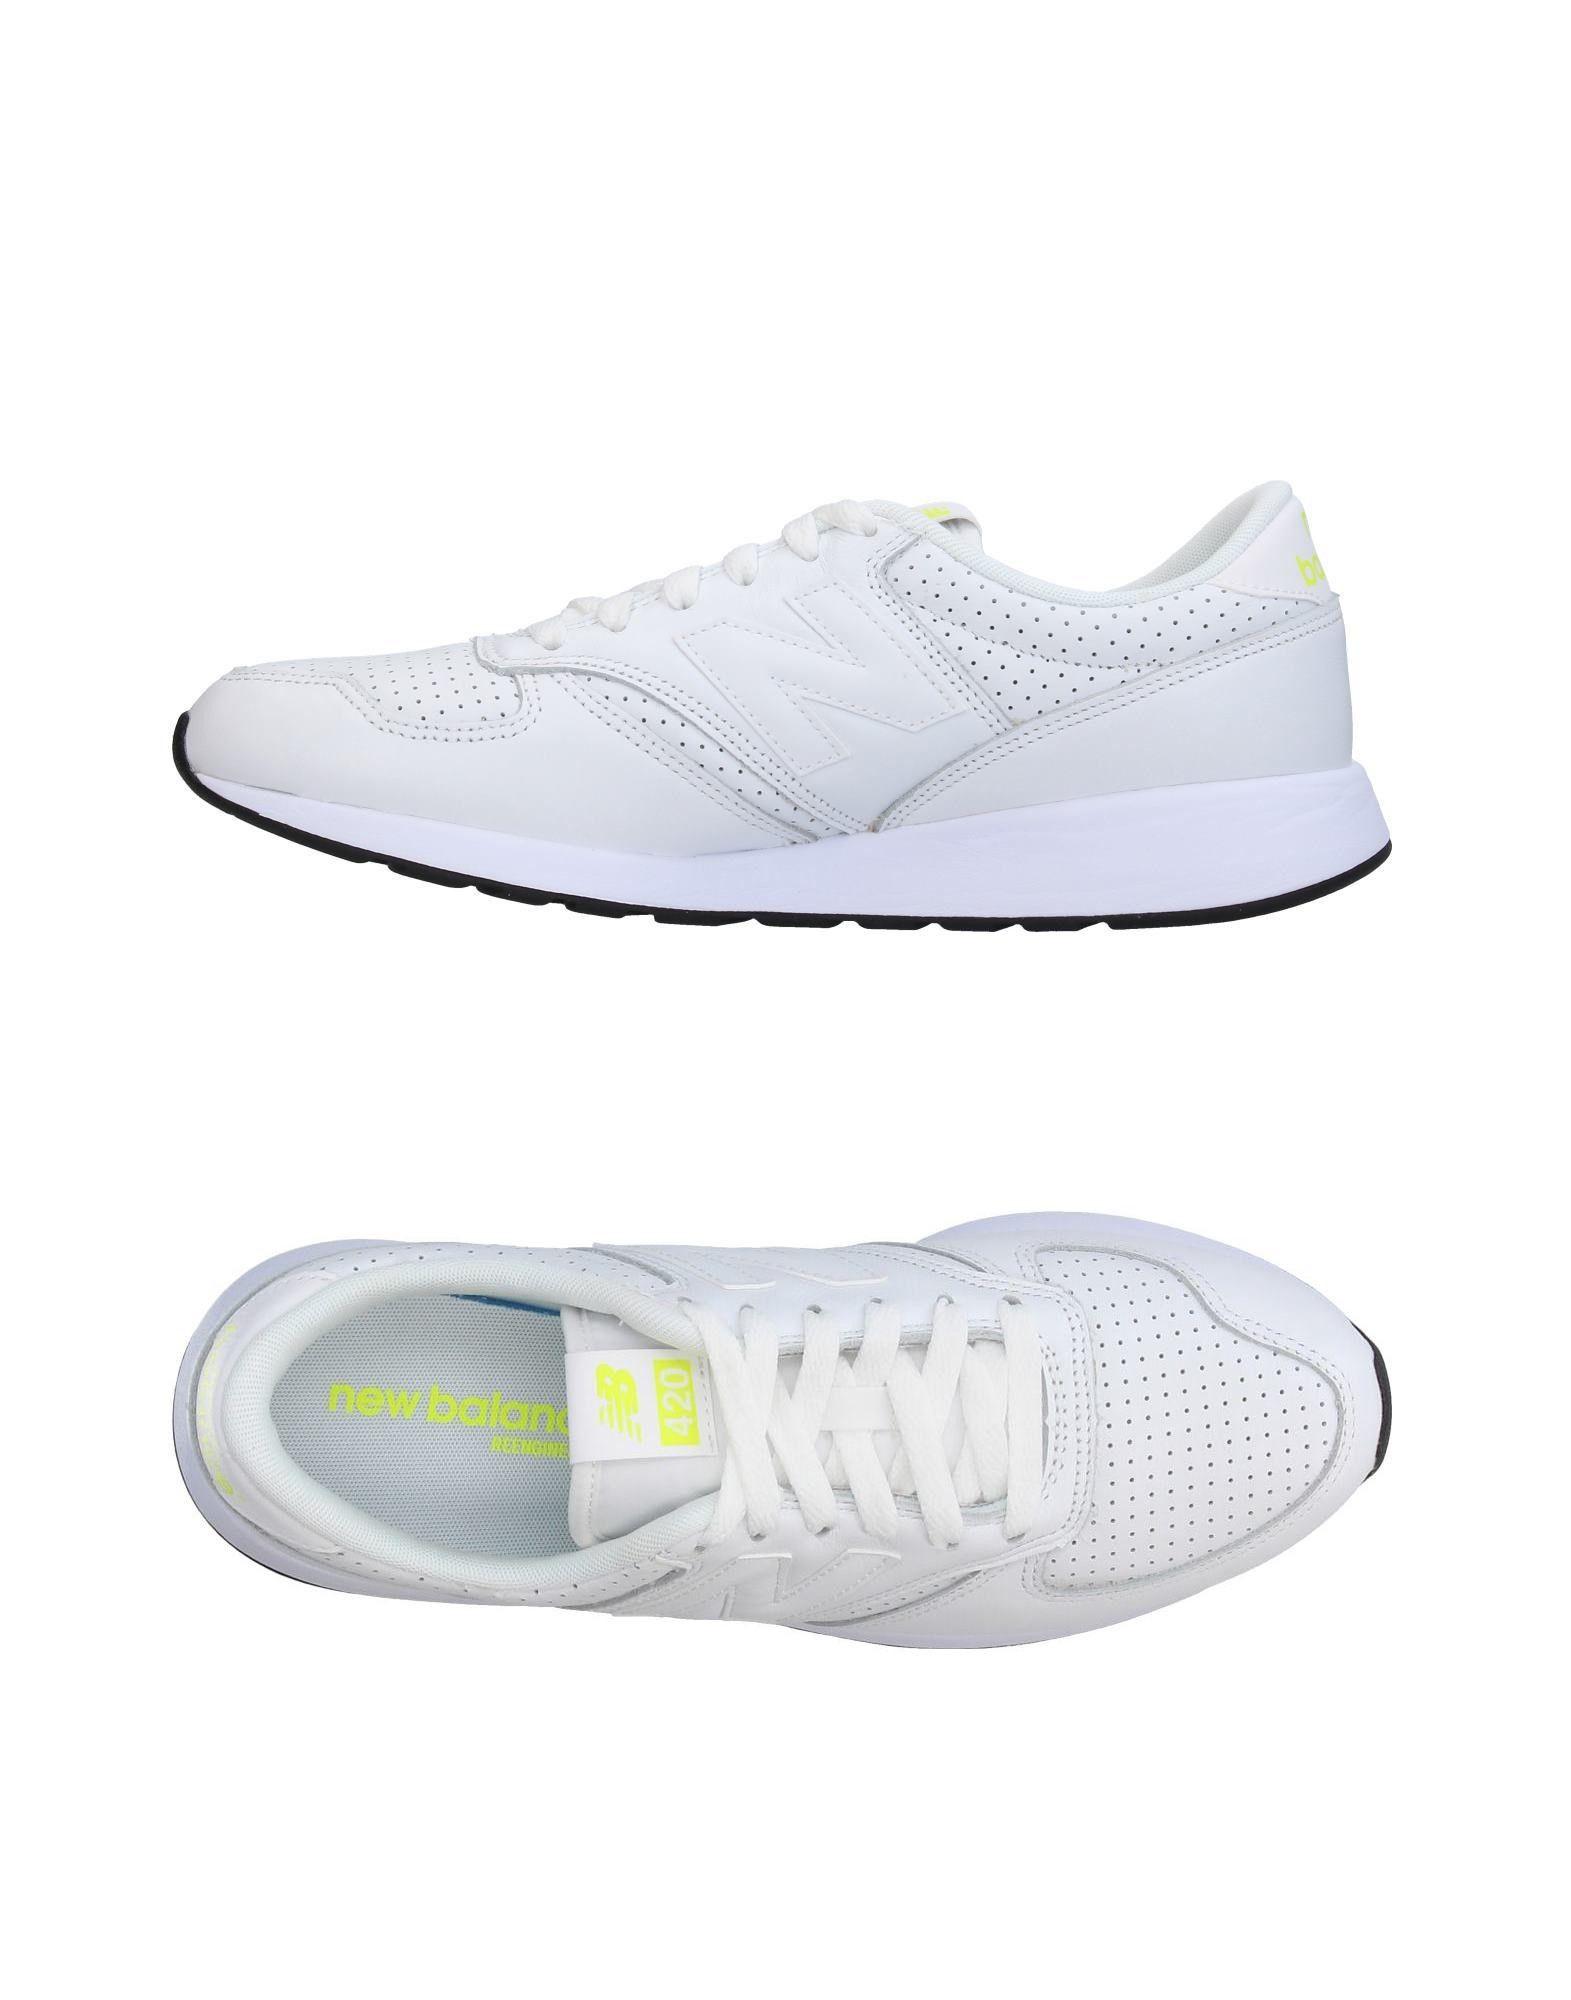 Sneakers New Balance Uomo - 11388271PB 11388271PB - 282788